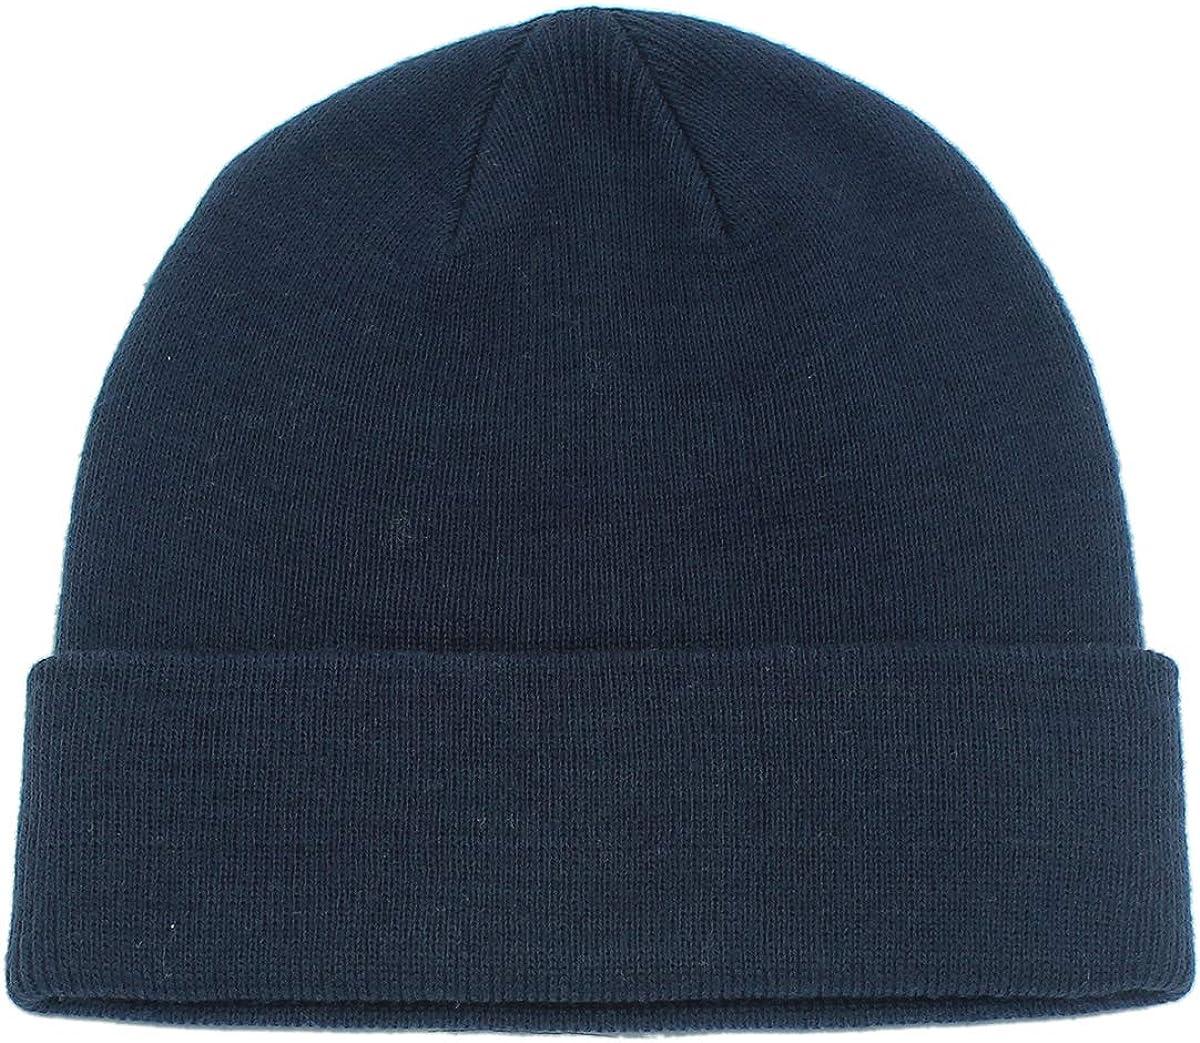 Mens Winter Acrylic Hat Outdoor Sport Knit Caps Soft Warm Ski Hat Womens Beanies Hat